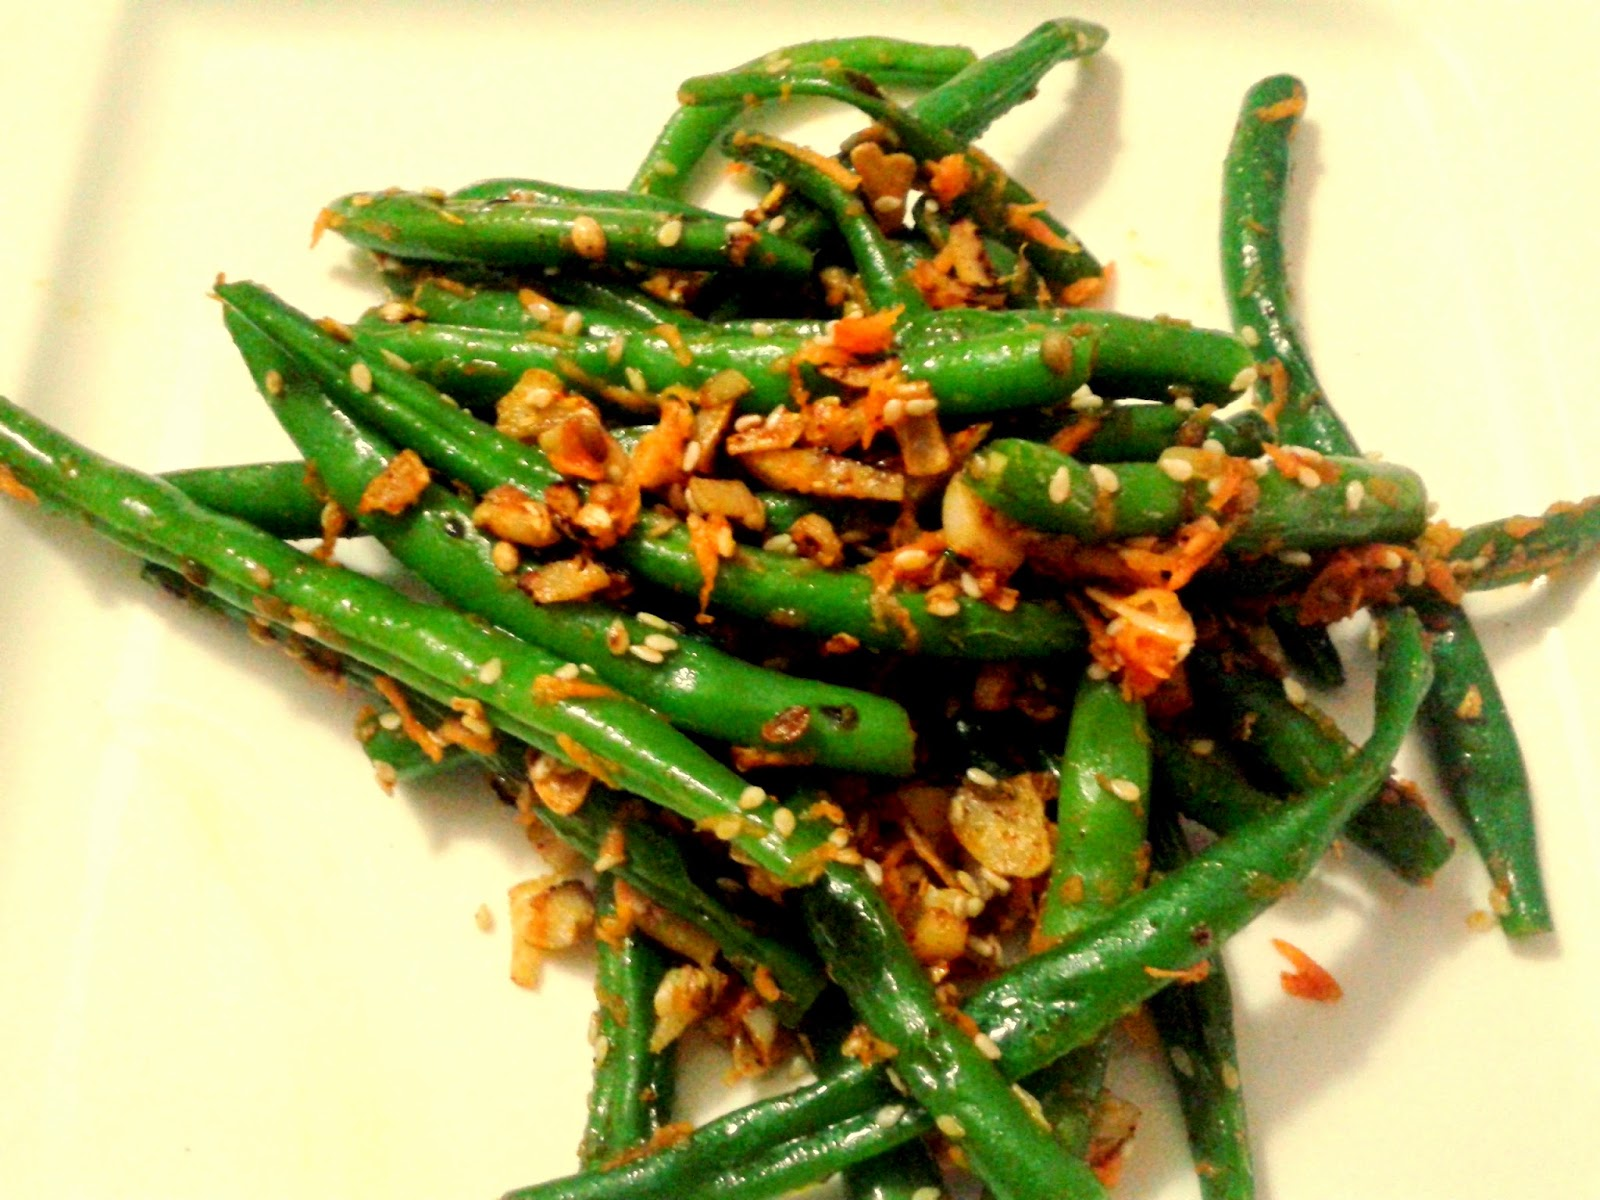 http://agoodstuff.blogspot.in/2014/07/green-beans-with-garlic-sesame.html